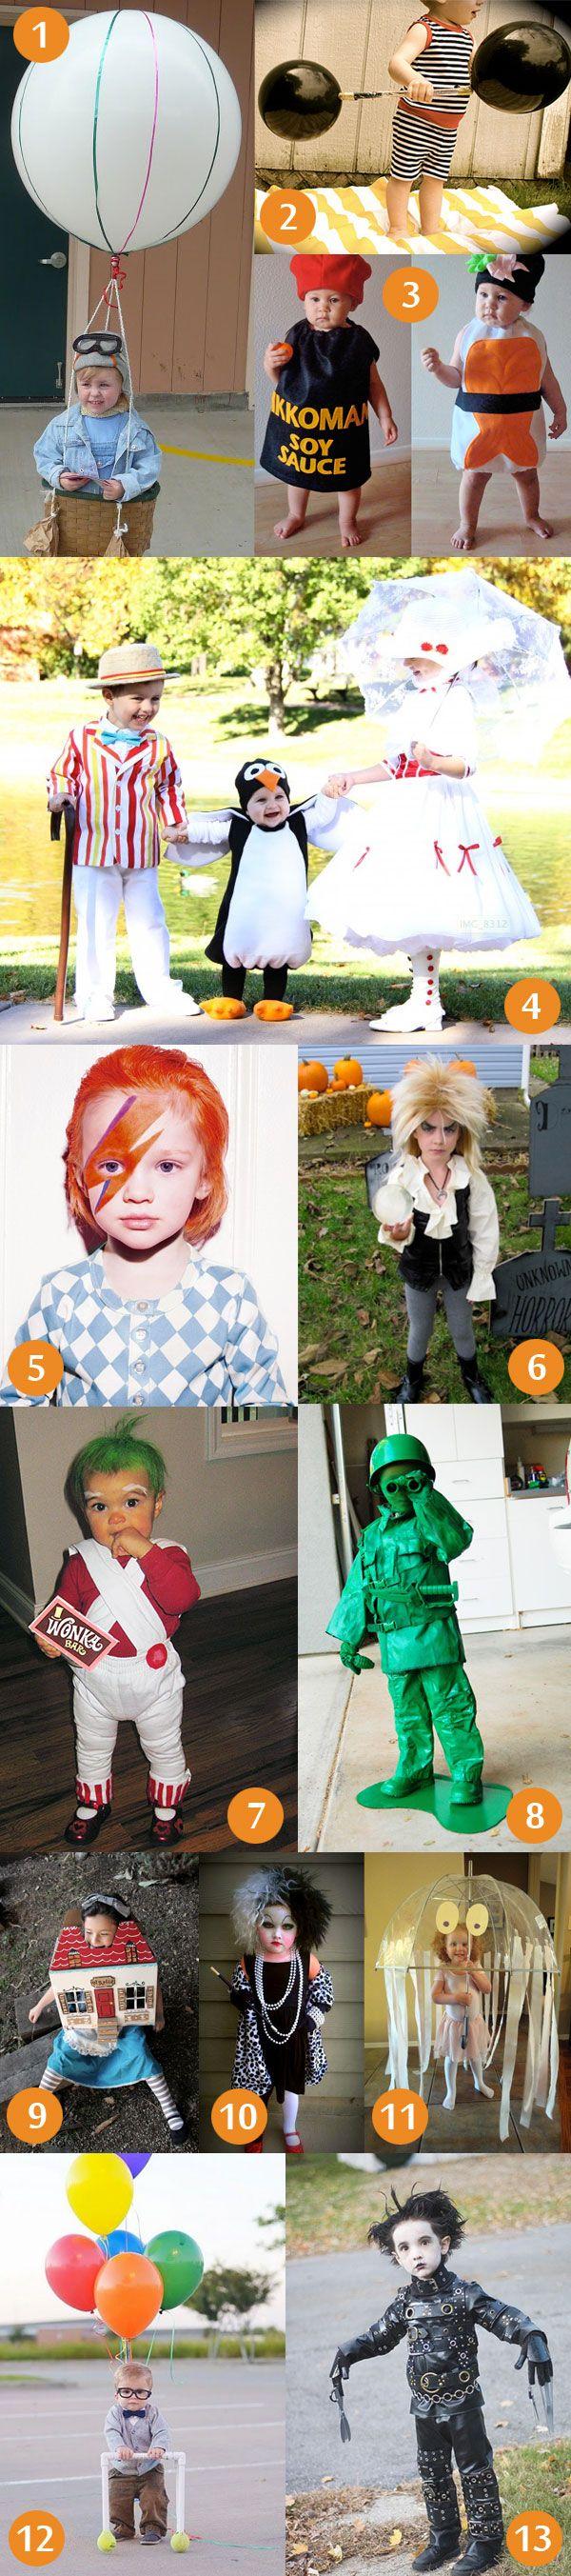 Halloween: unusual creative costumes, ideas for halloween fancy dress #halloween #costume